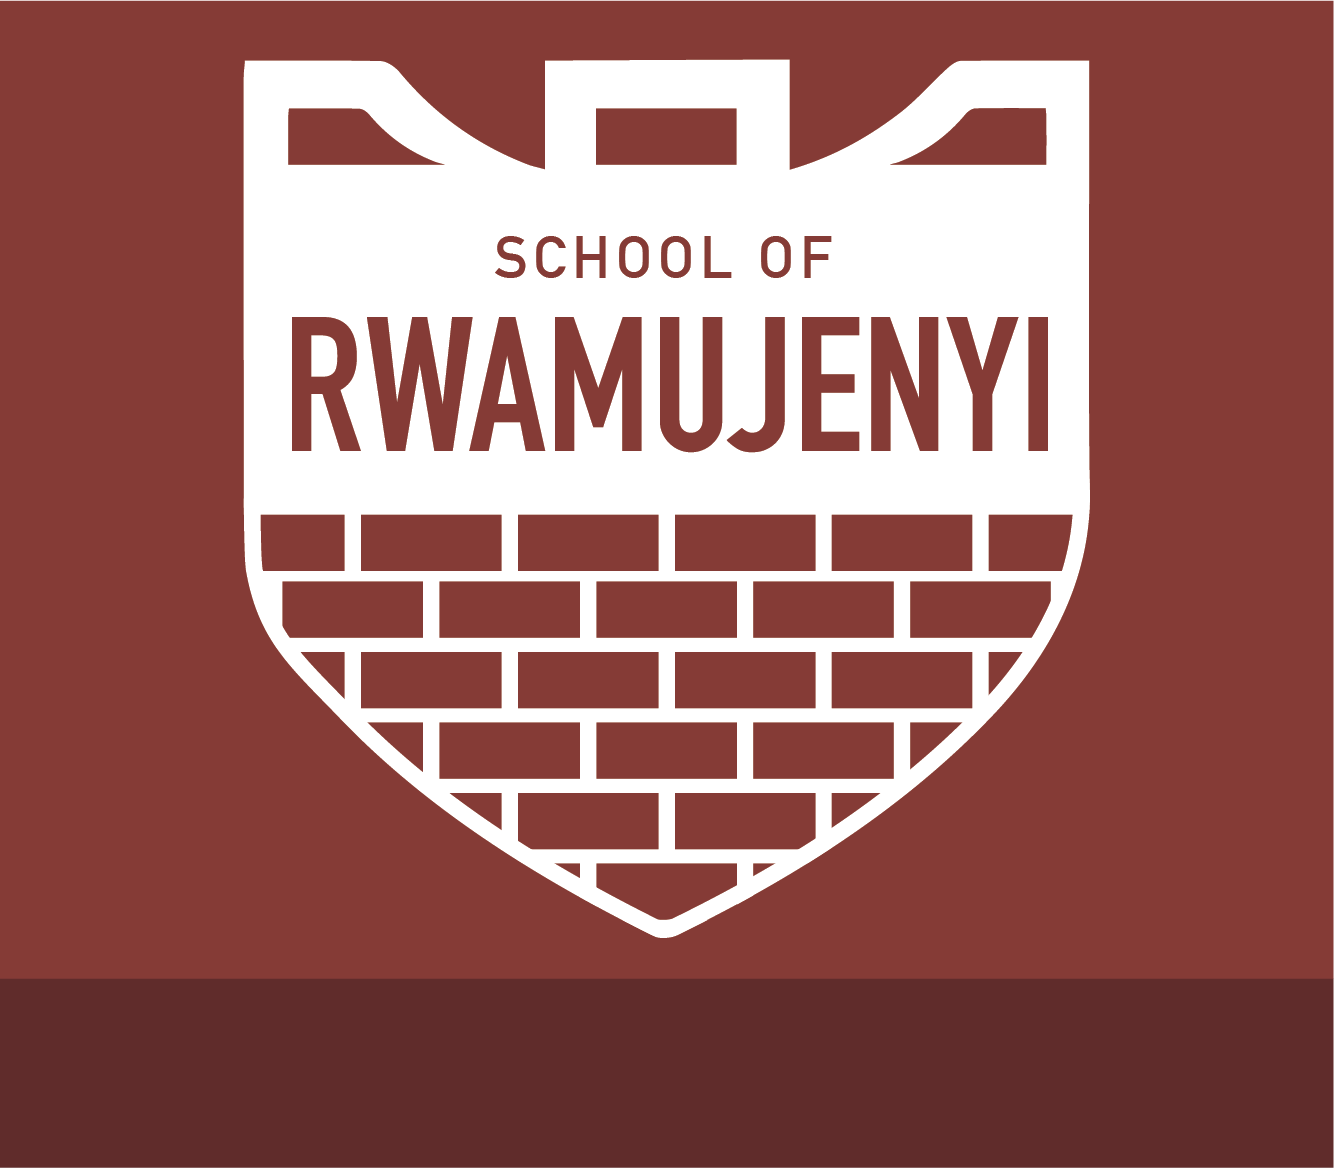 School of rwamujenyi